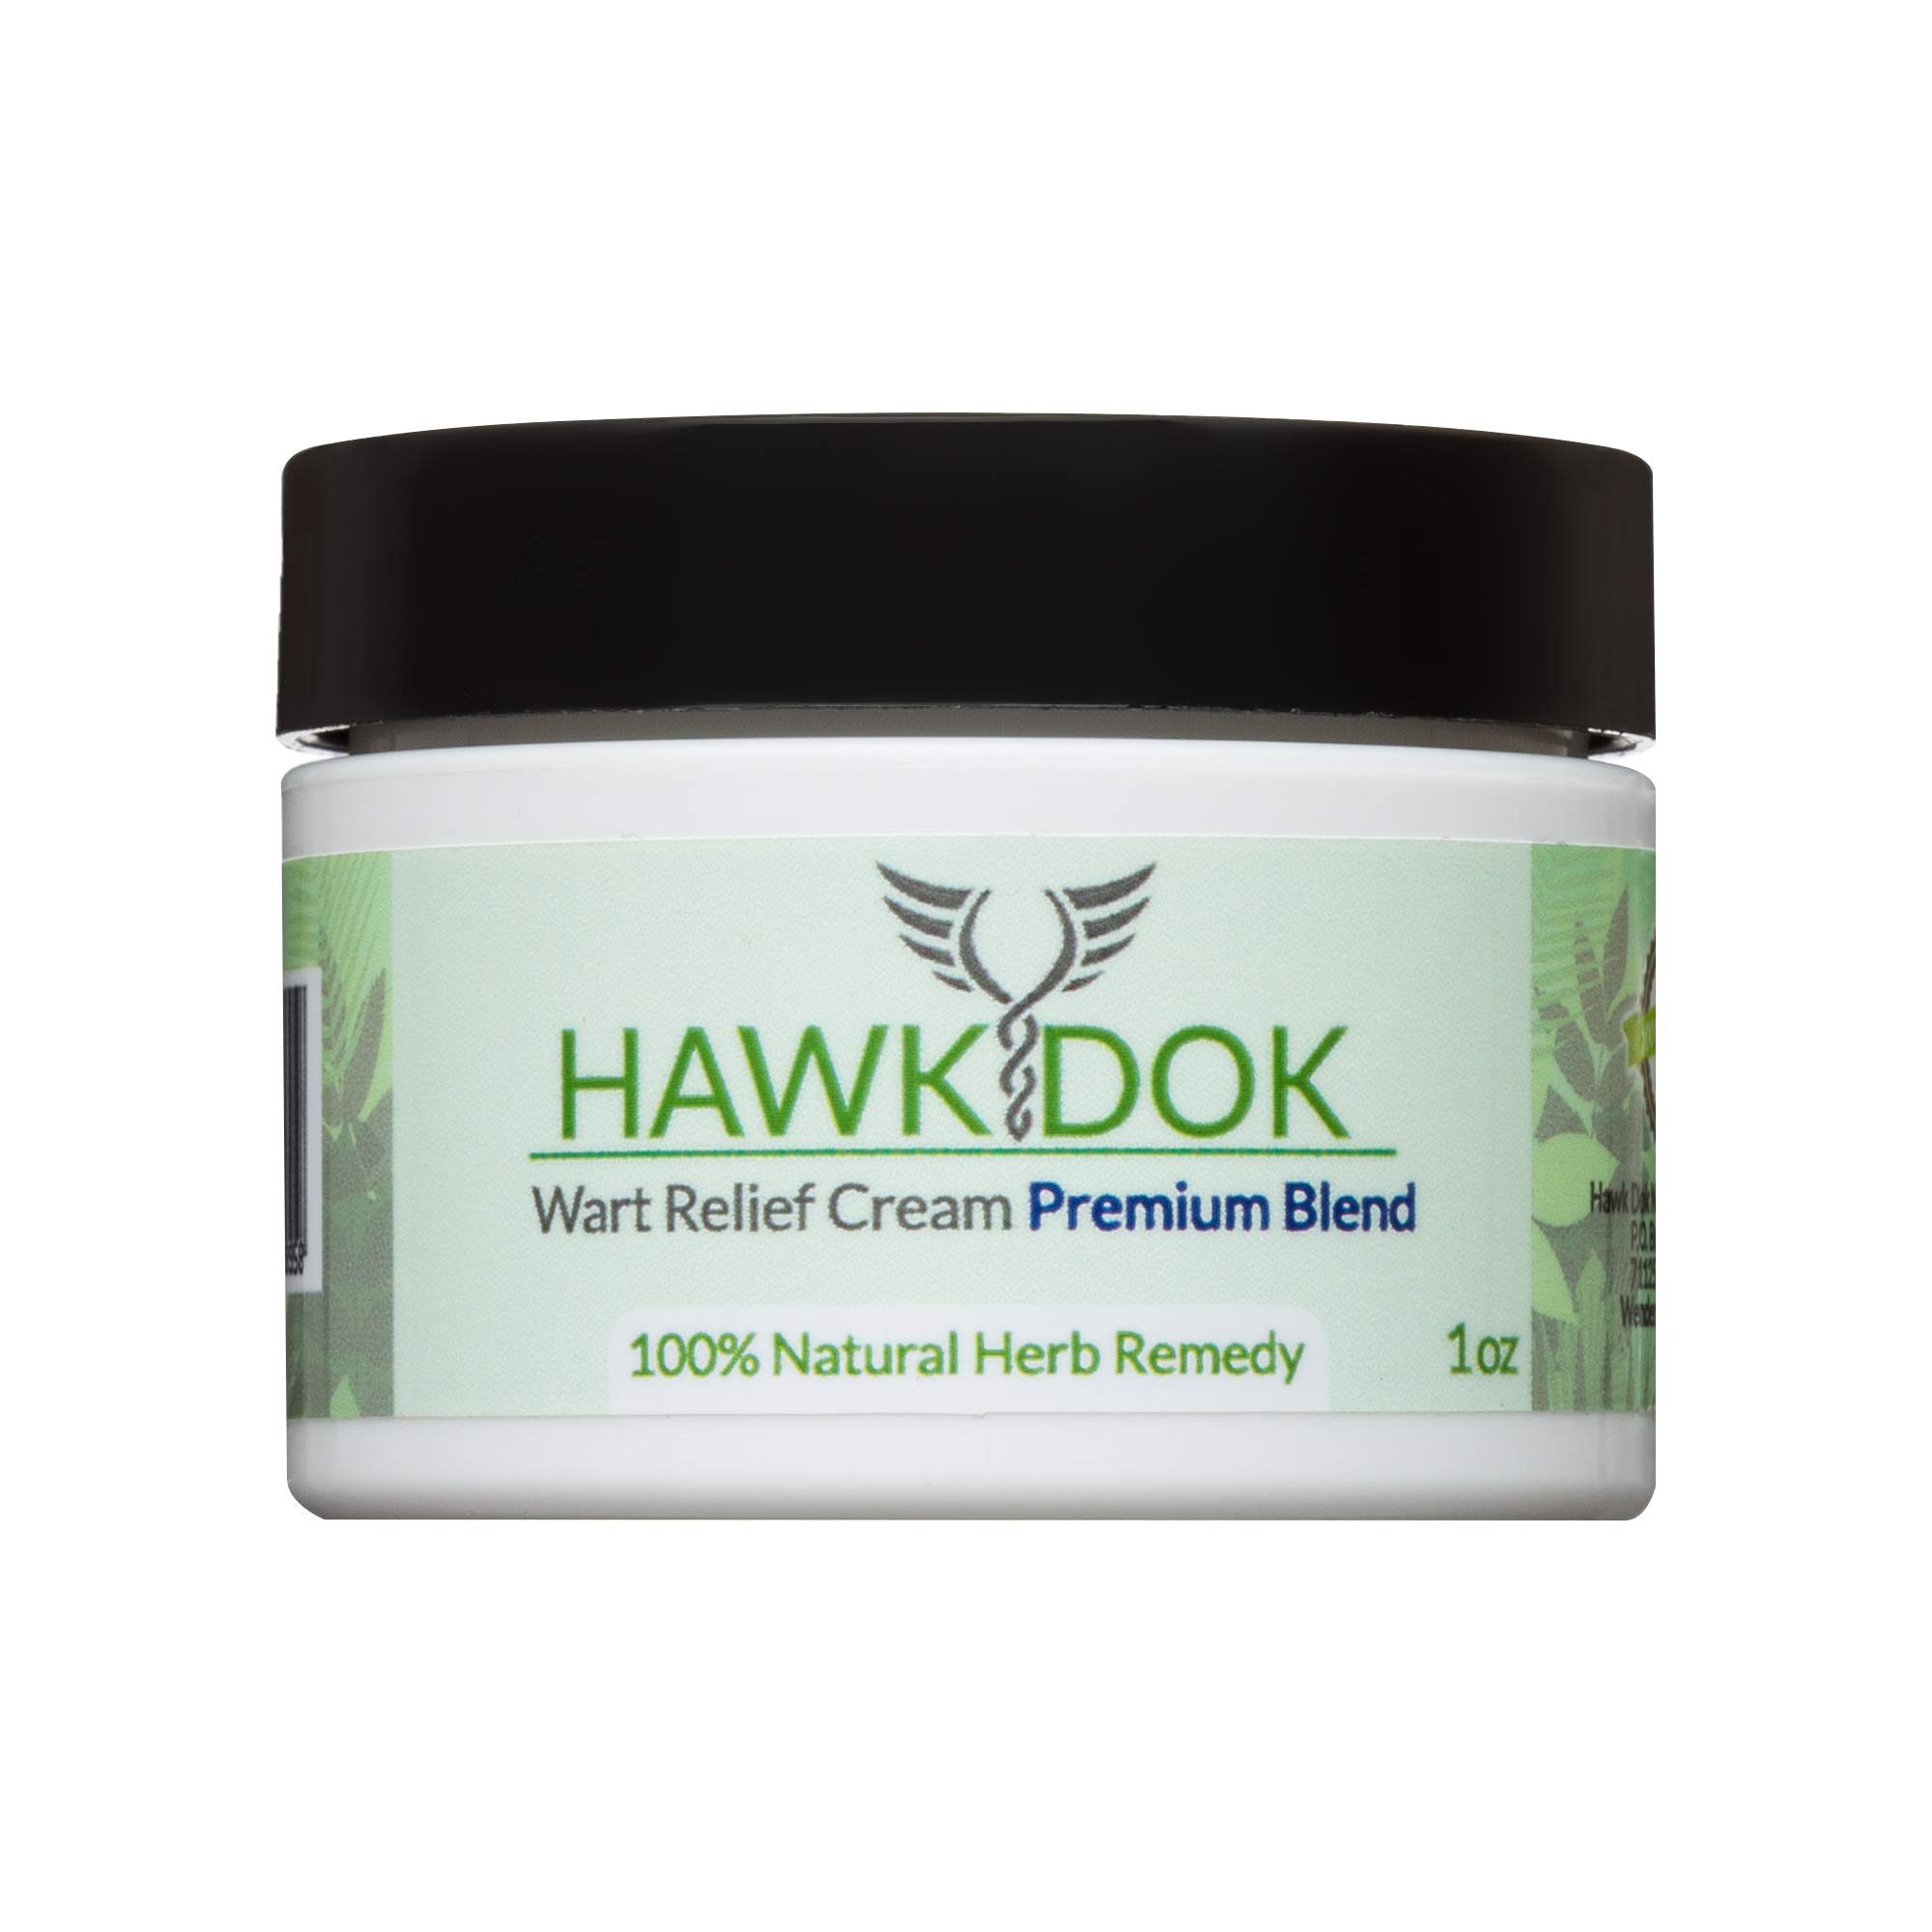 Hawk Dok Genital Wart Relief Cream, Herbal Natural Warts Relief Premium Blend for Men and Women - 1oz by Hawk Dok